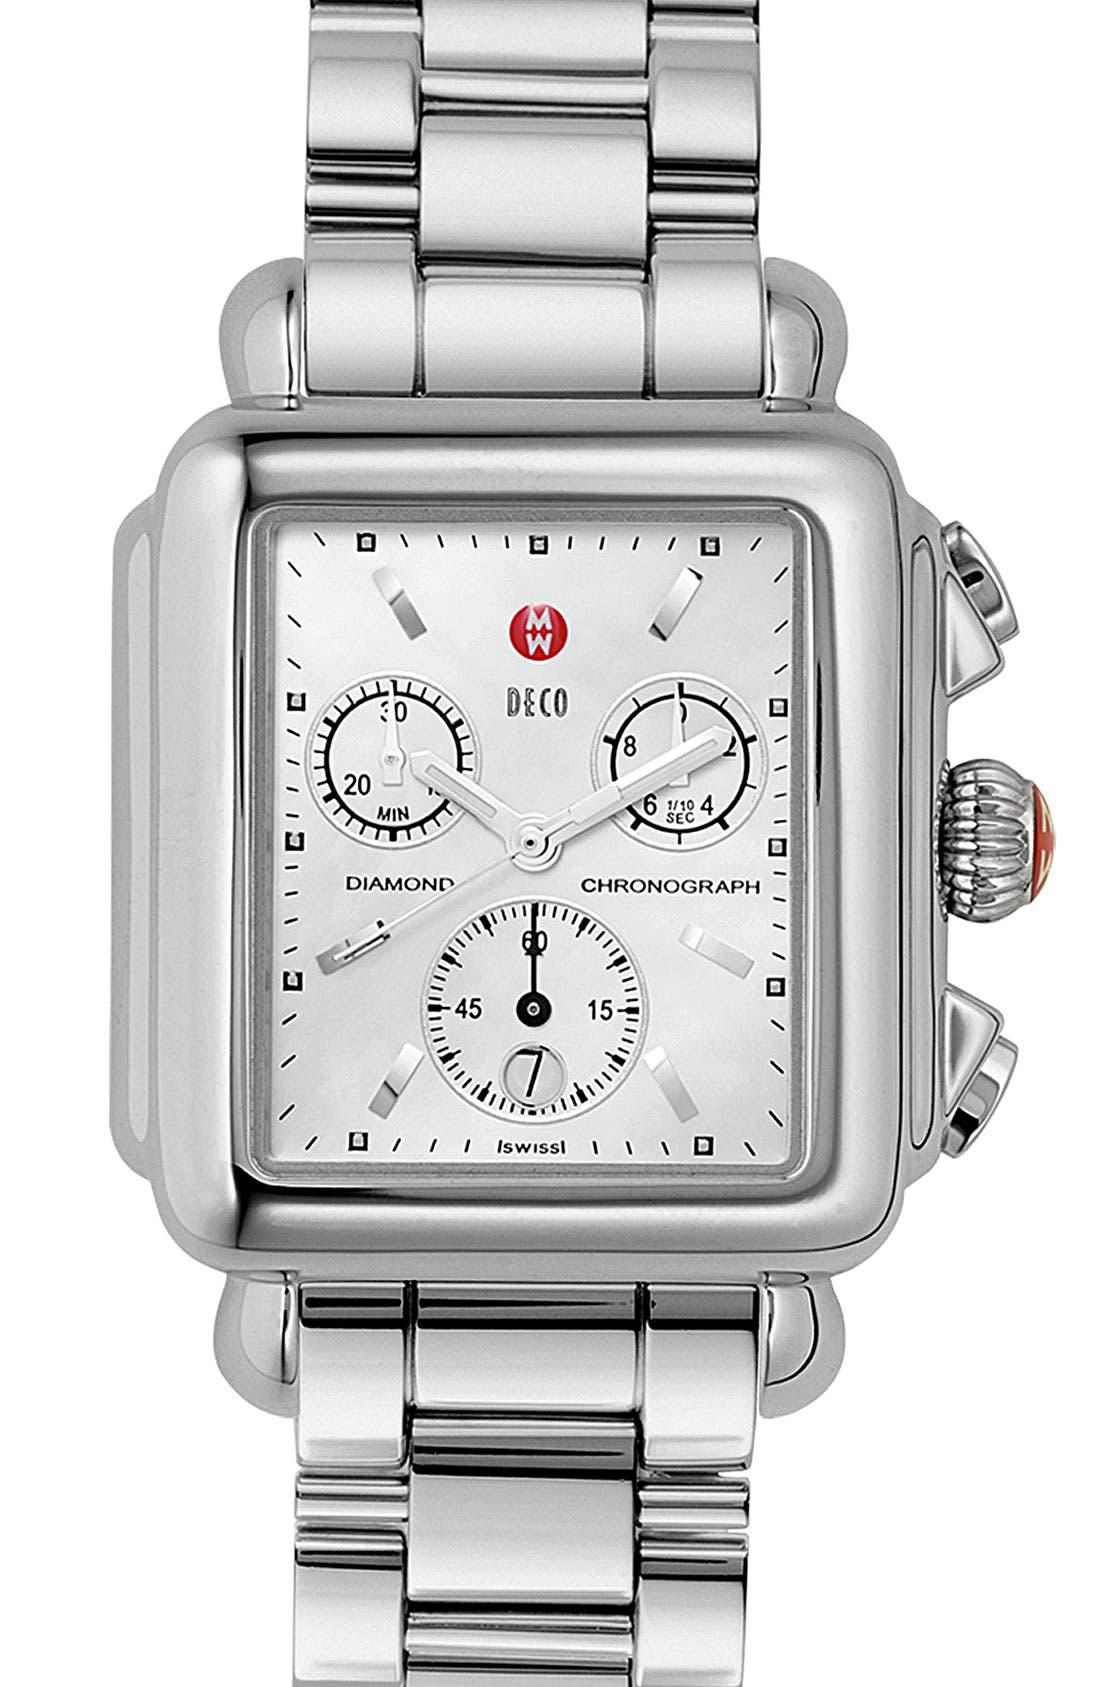 'Deco Carousel' Watch Case,                             Alternate thumbnail 2, color,                             040